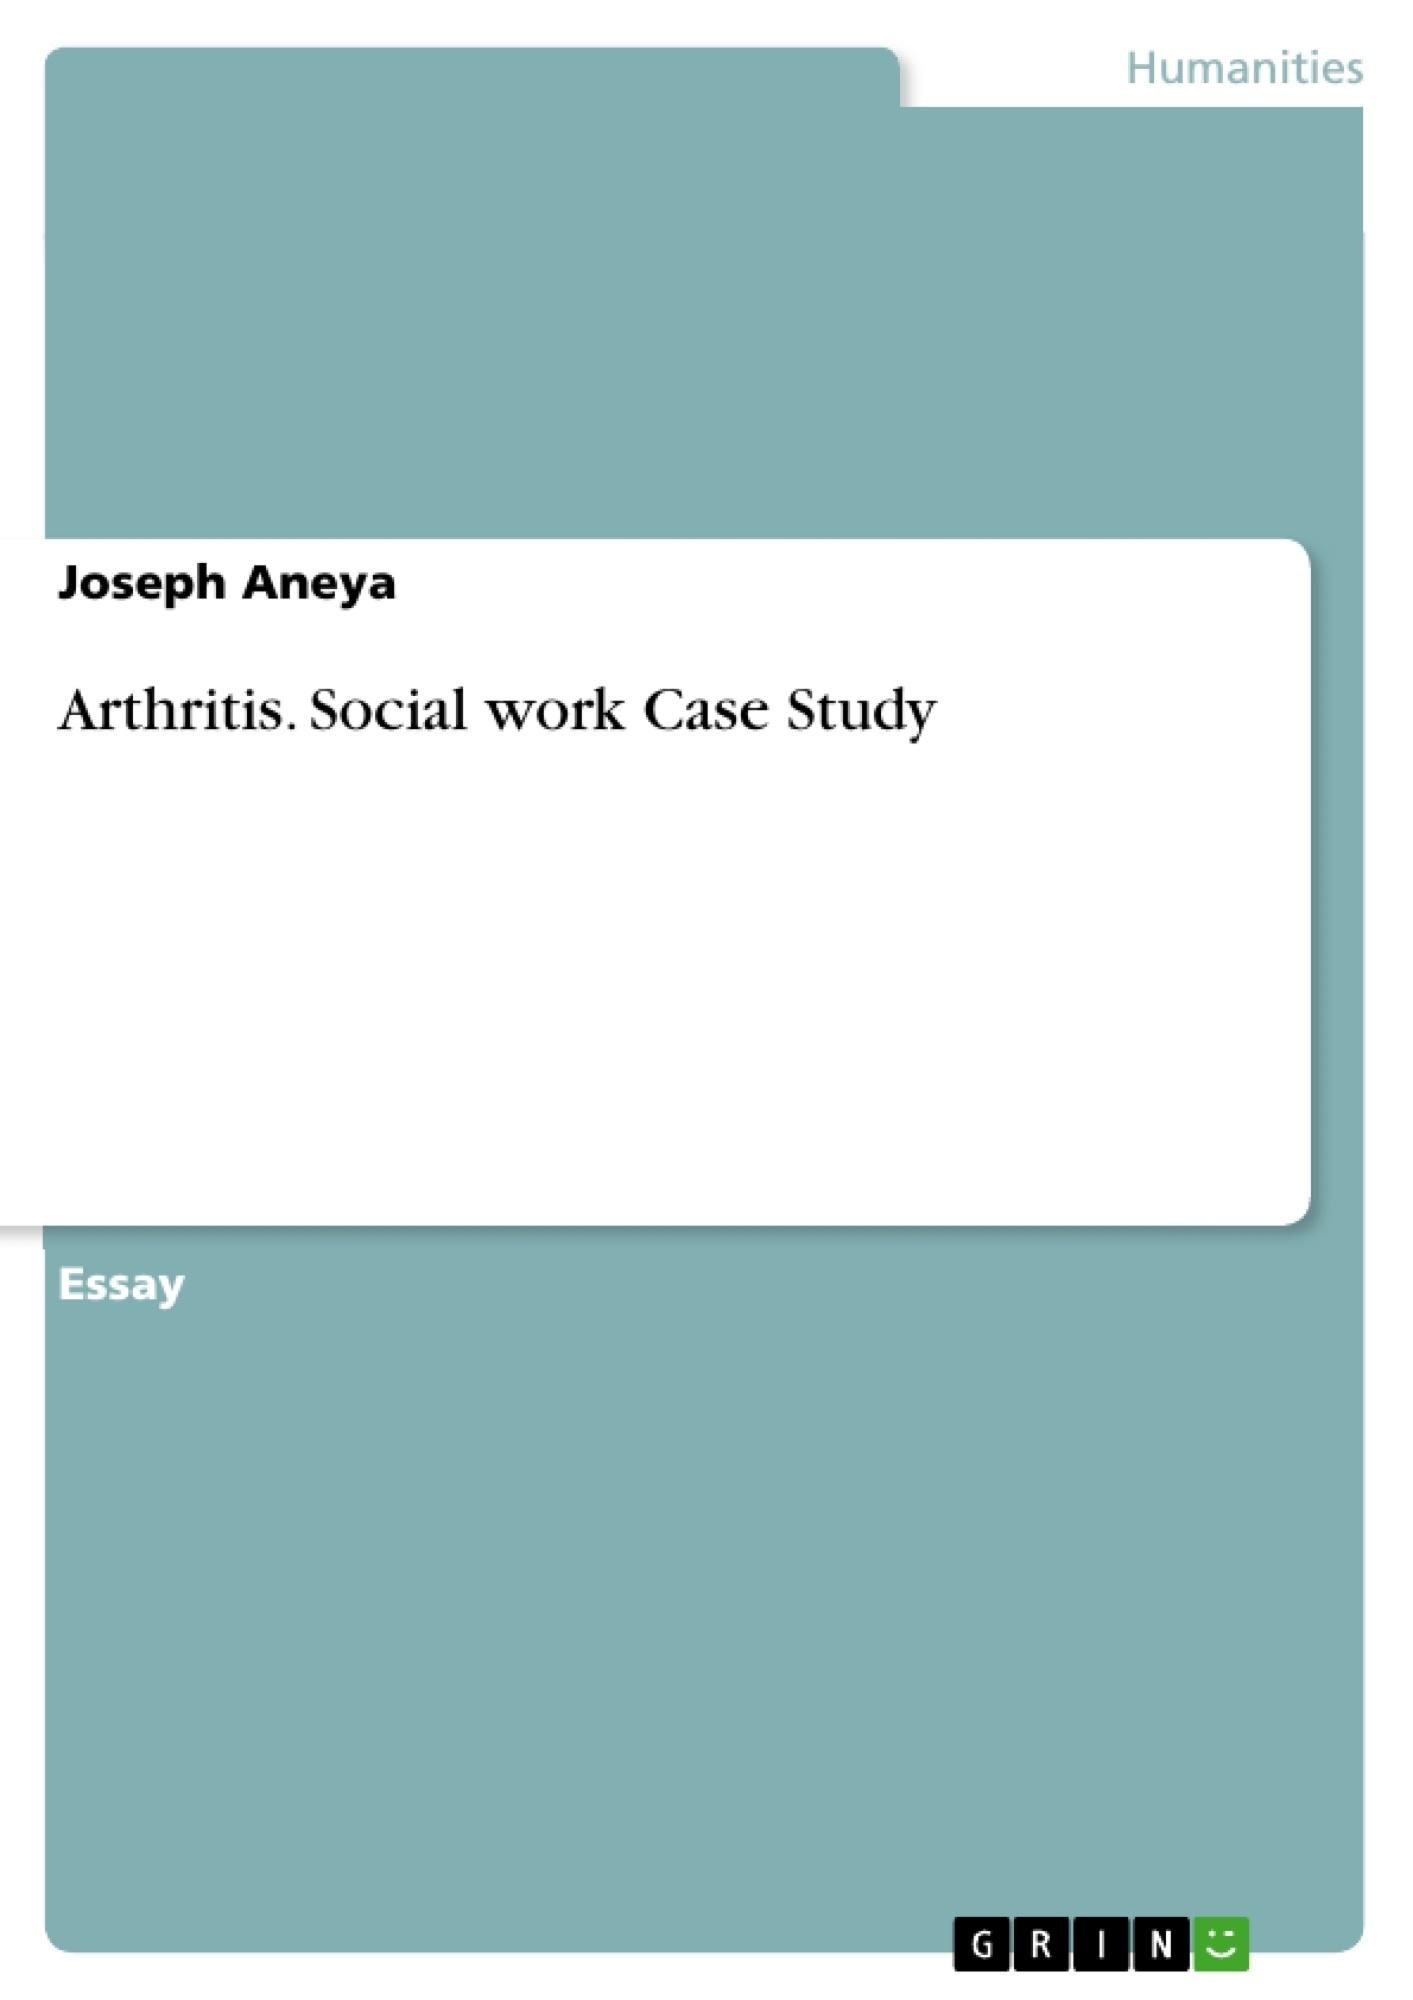 Title: Arthritis. Social work Case Study